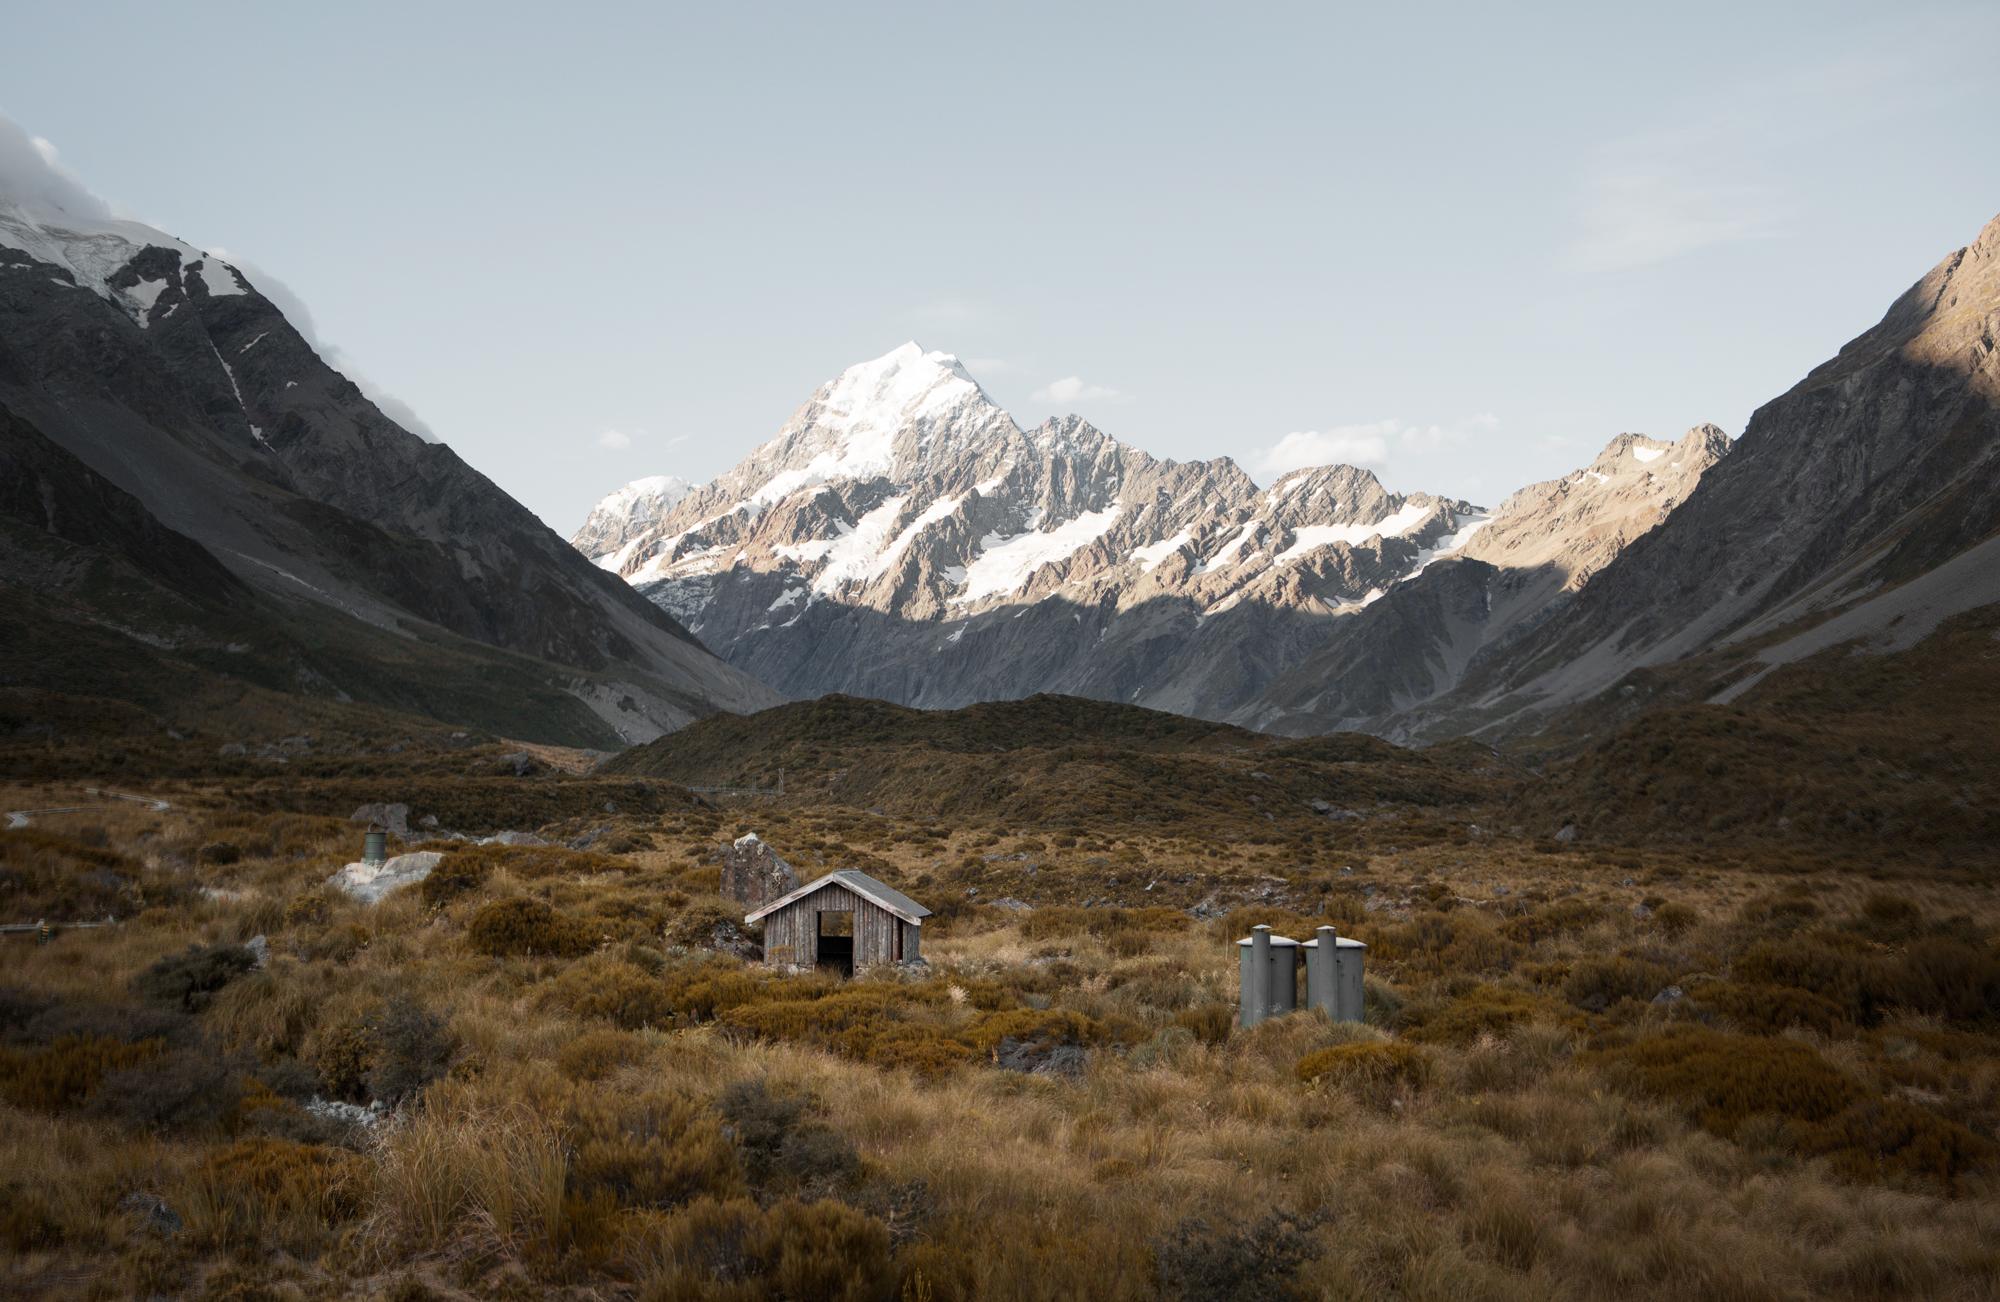 17-Bec_Kilpatrick_Photography_New_ZealandBEC_6519